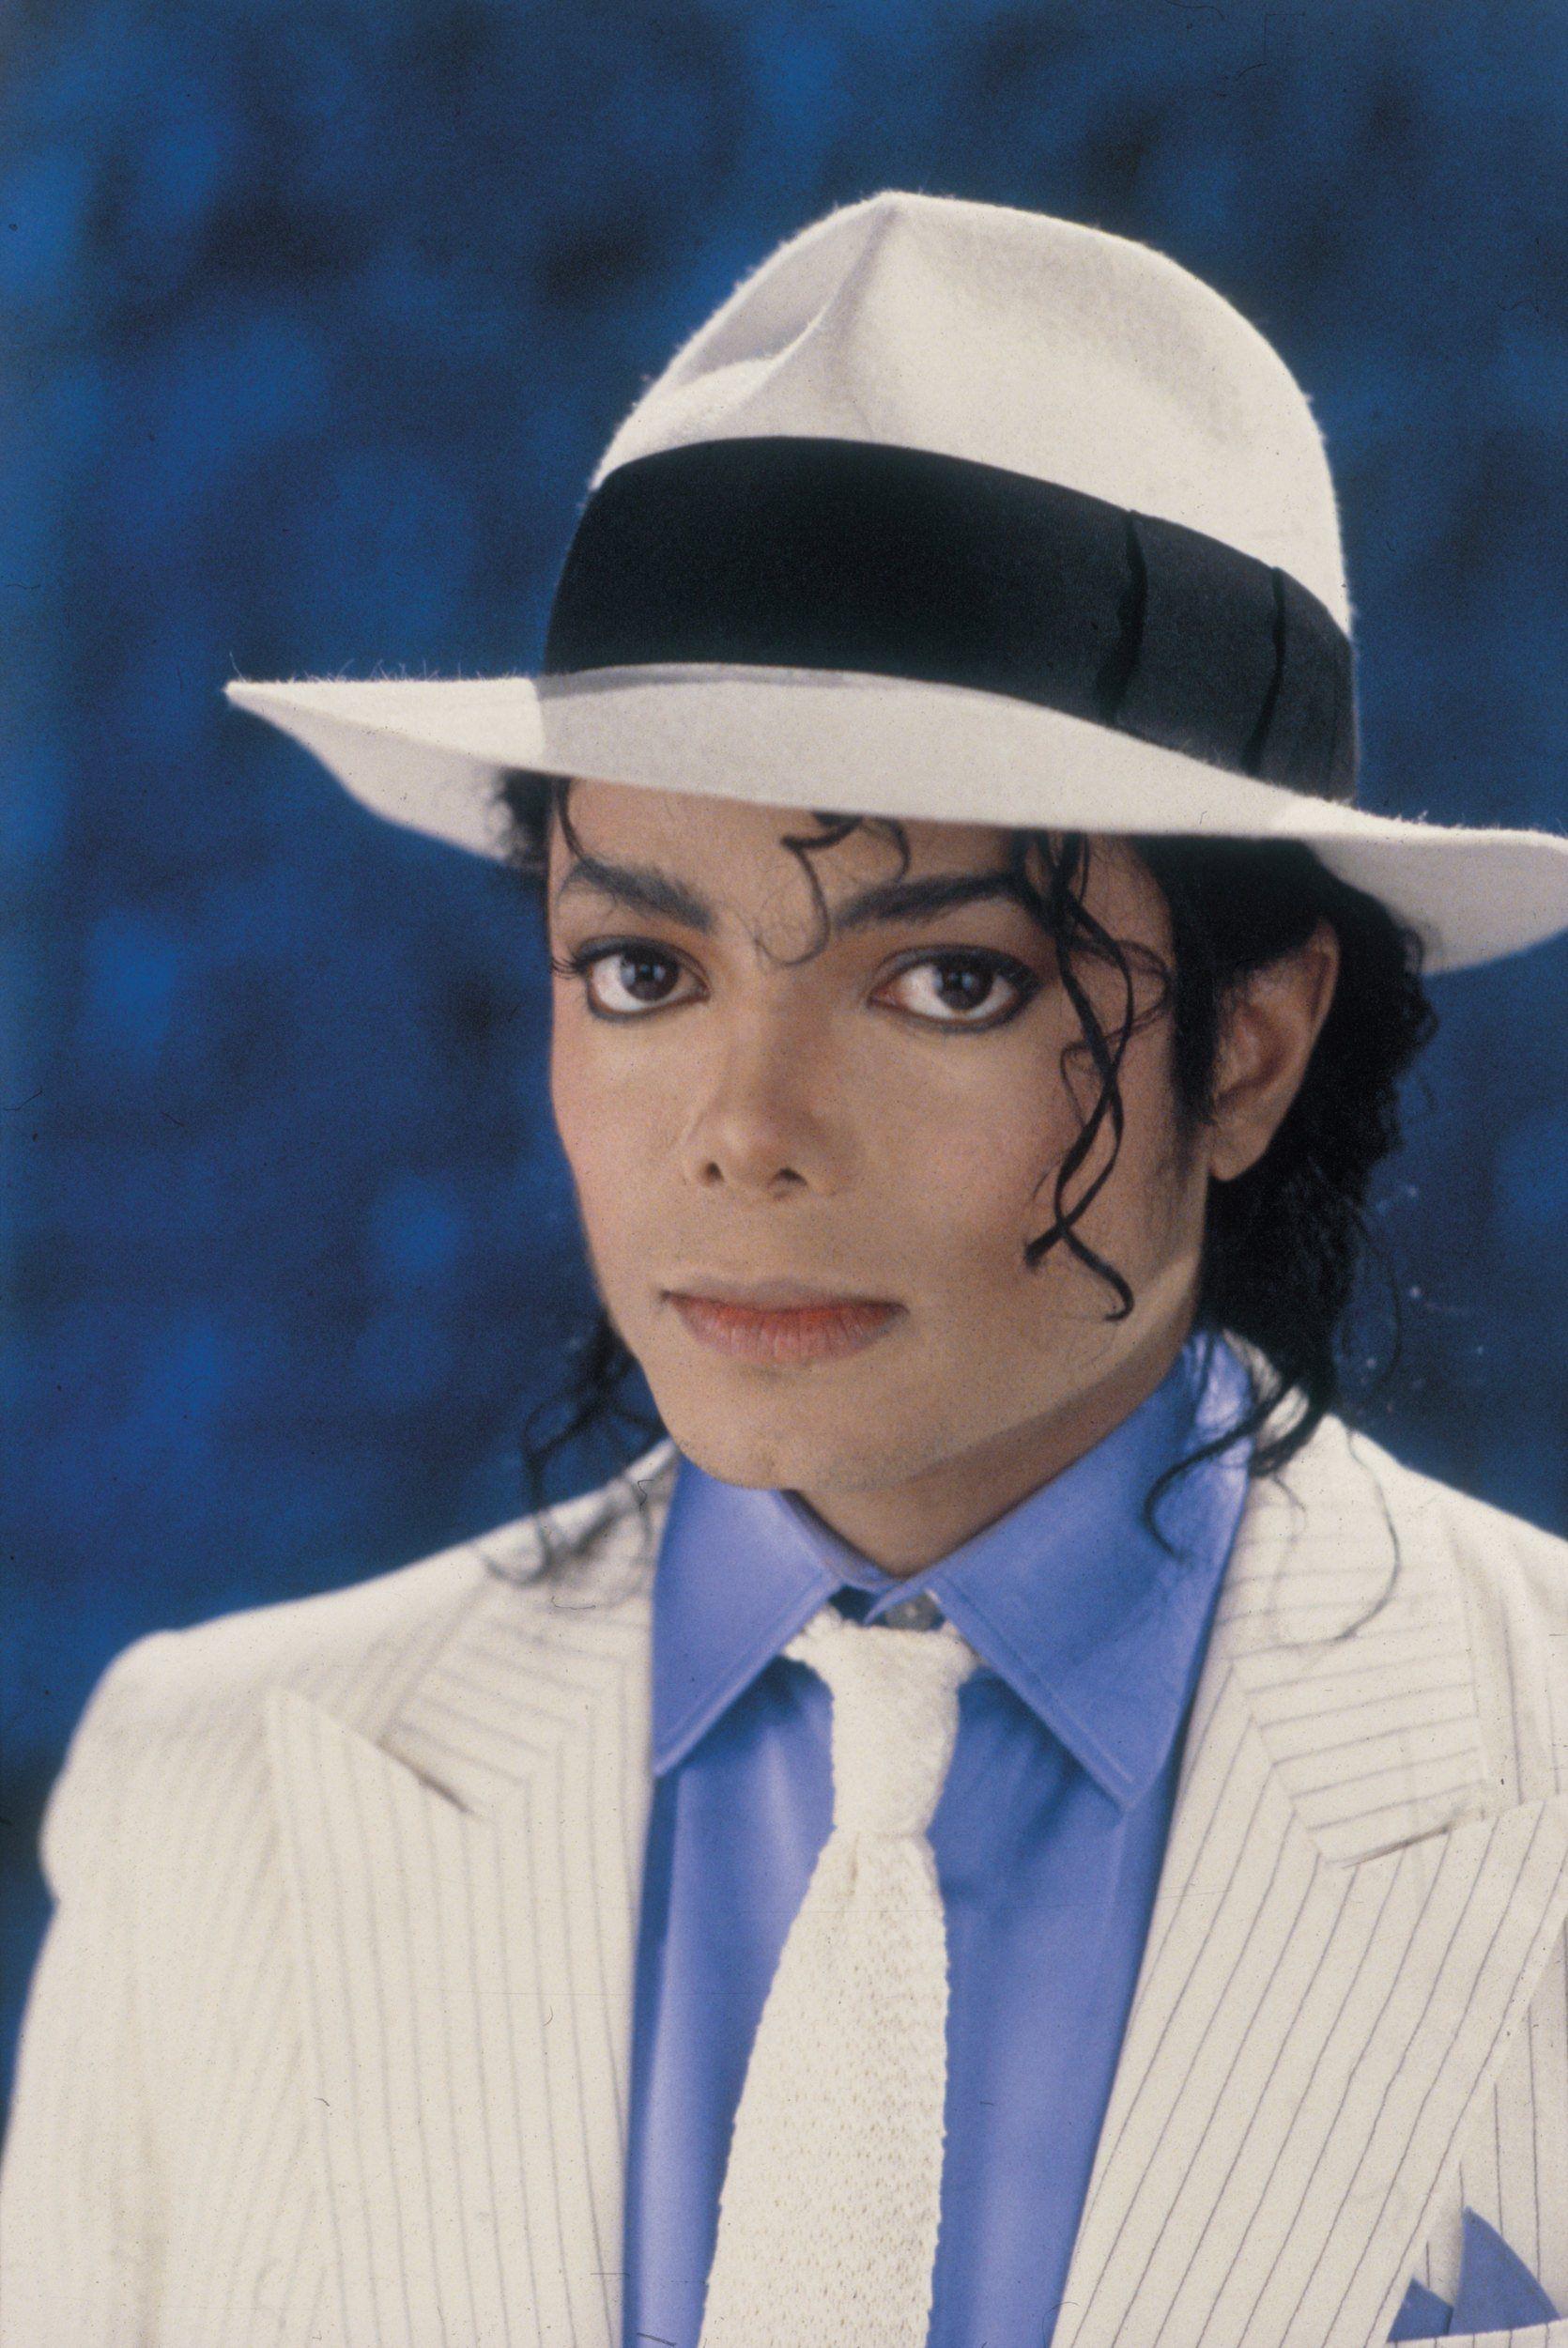 Michael Jackson (HQ = High Quality) - Michael Jackson Photo ...